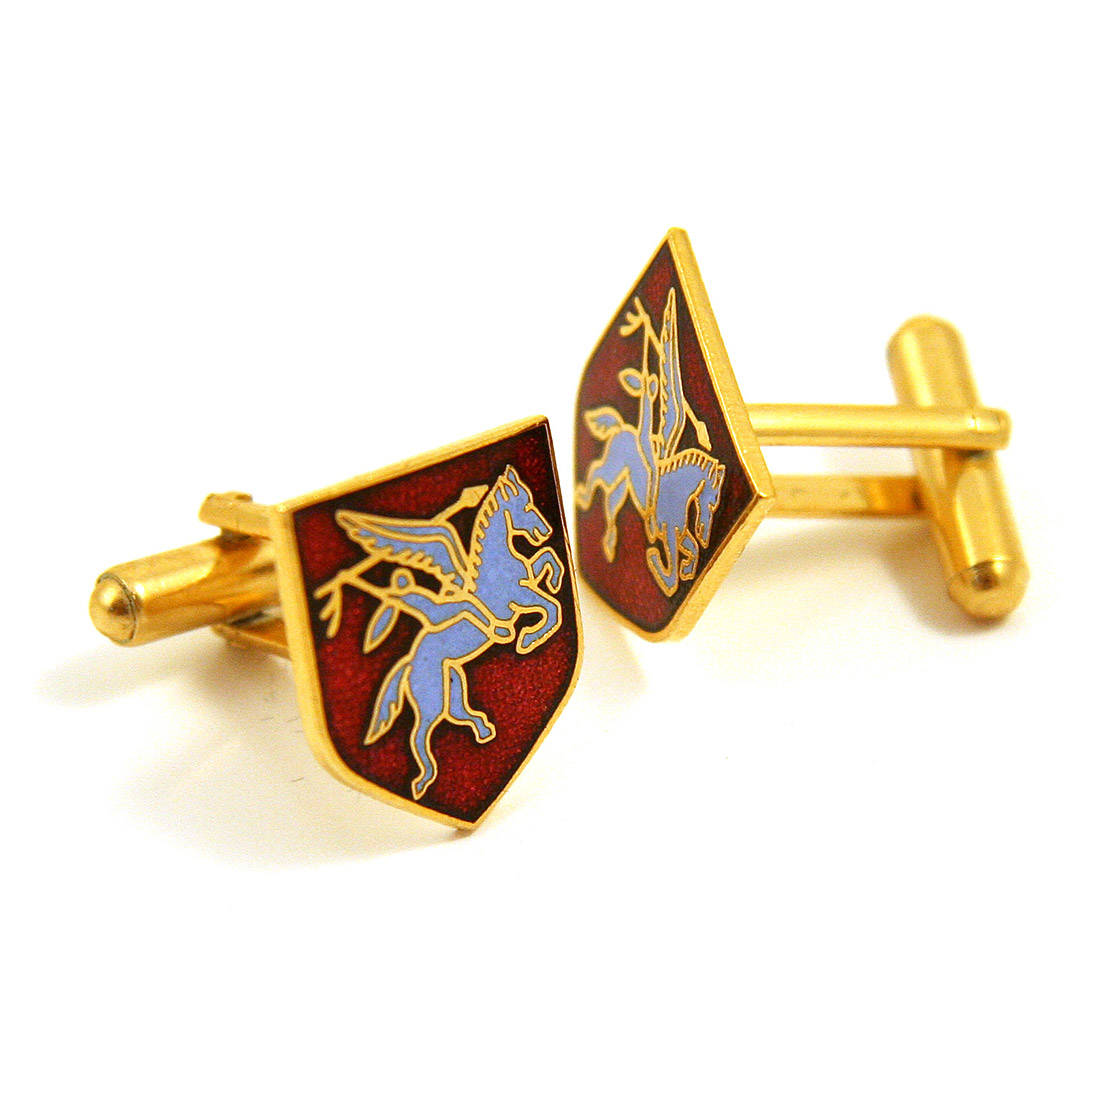 Pegasus Shield Cufflinks (Enamel Badge)